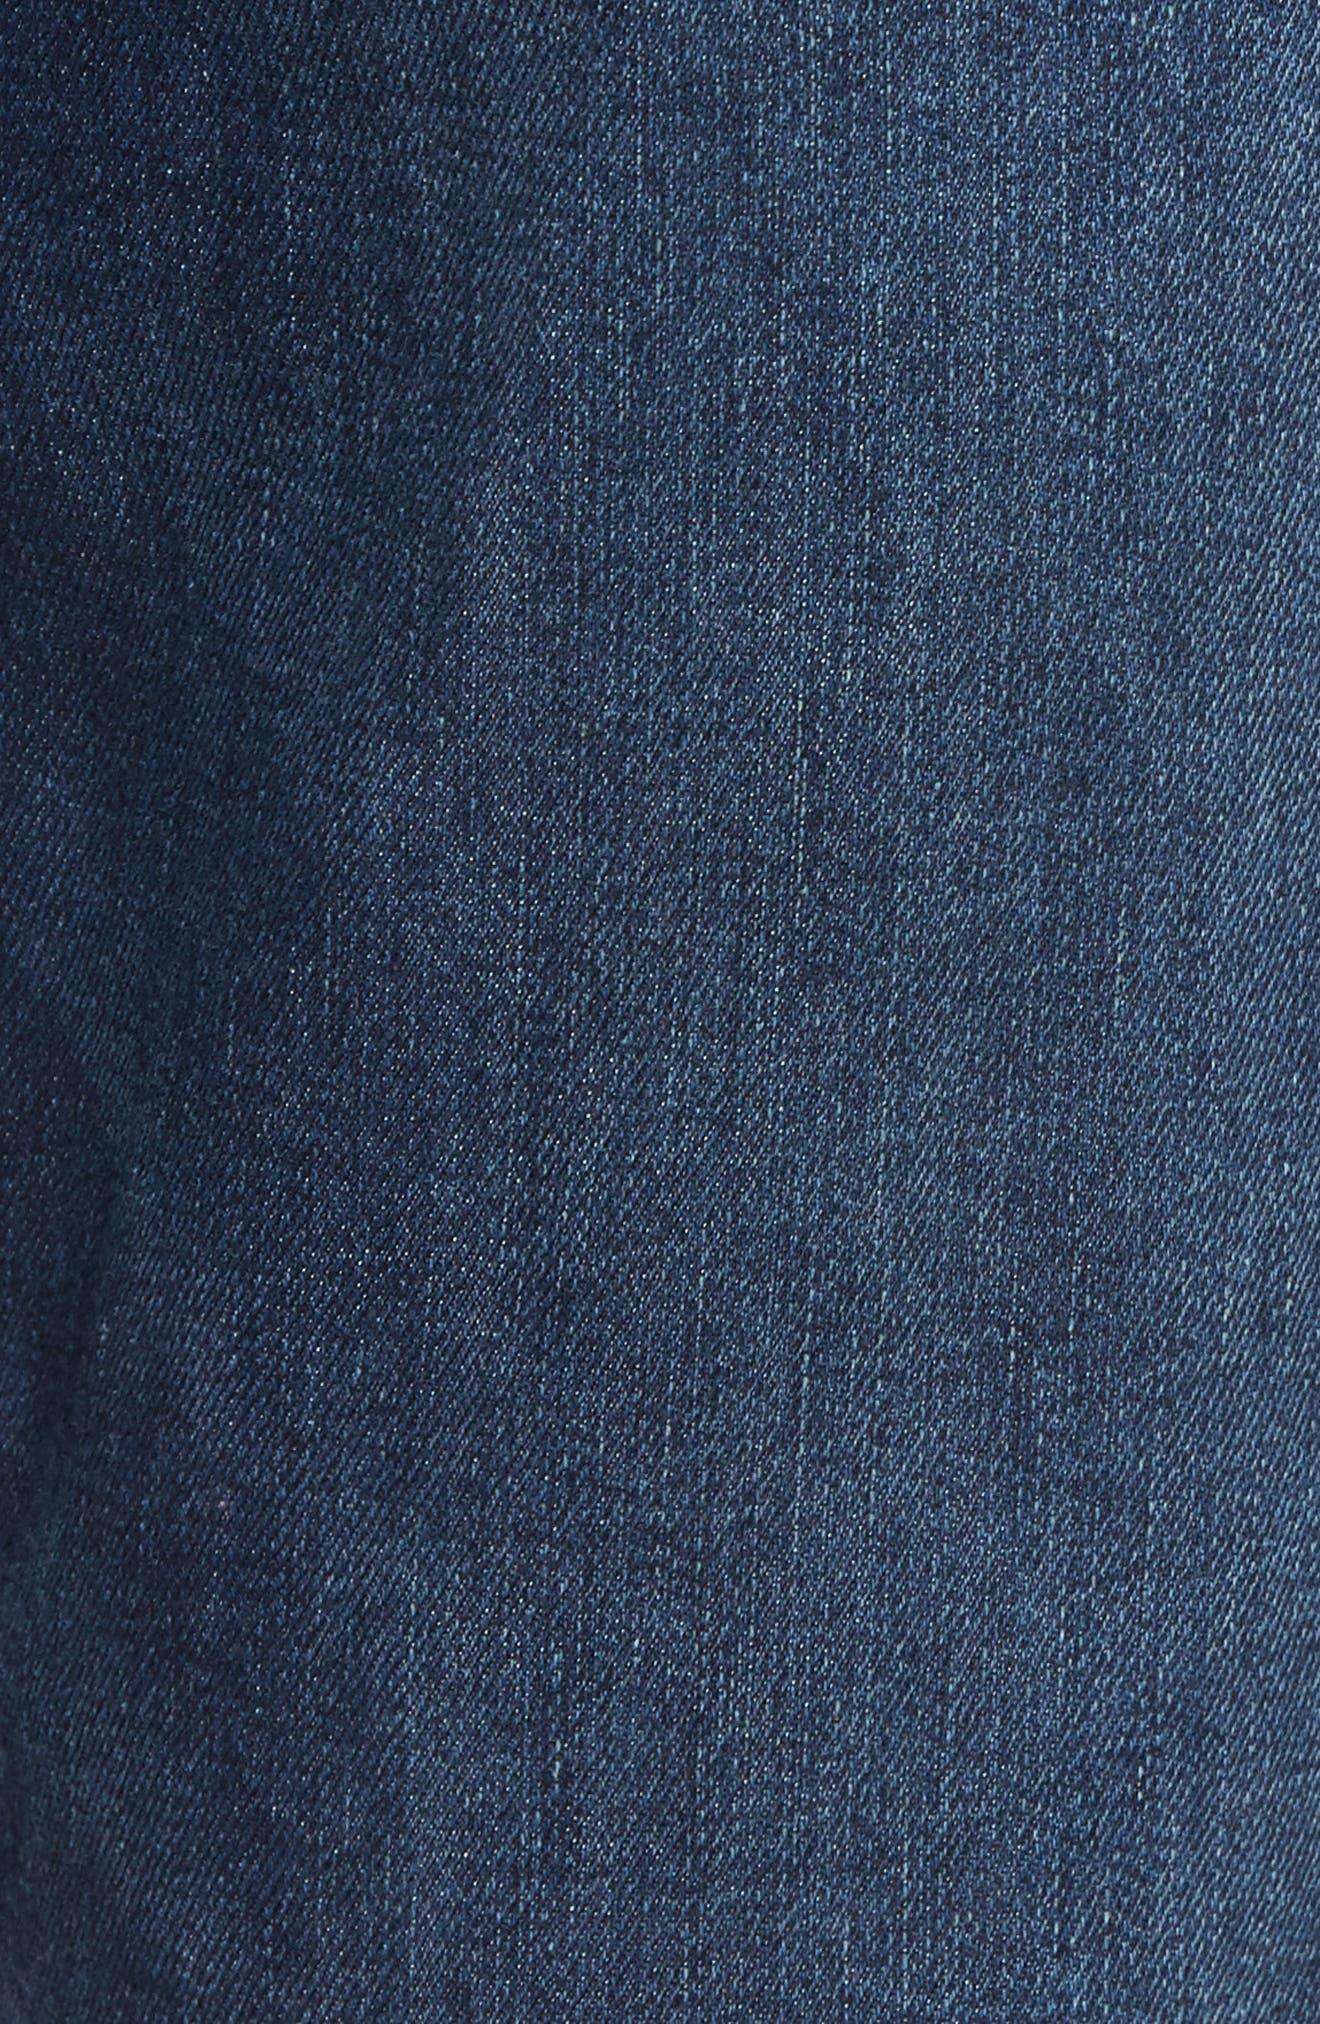 Slim Fit Jeans,                             Alternate thumbnail 5, color,                             Yates